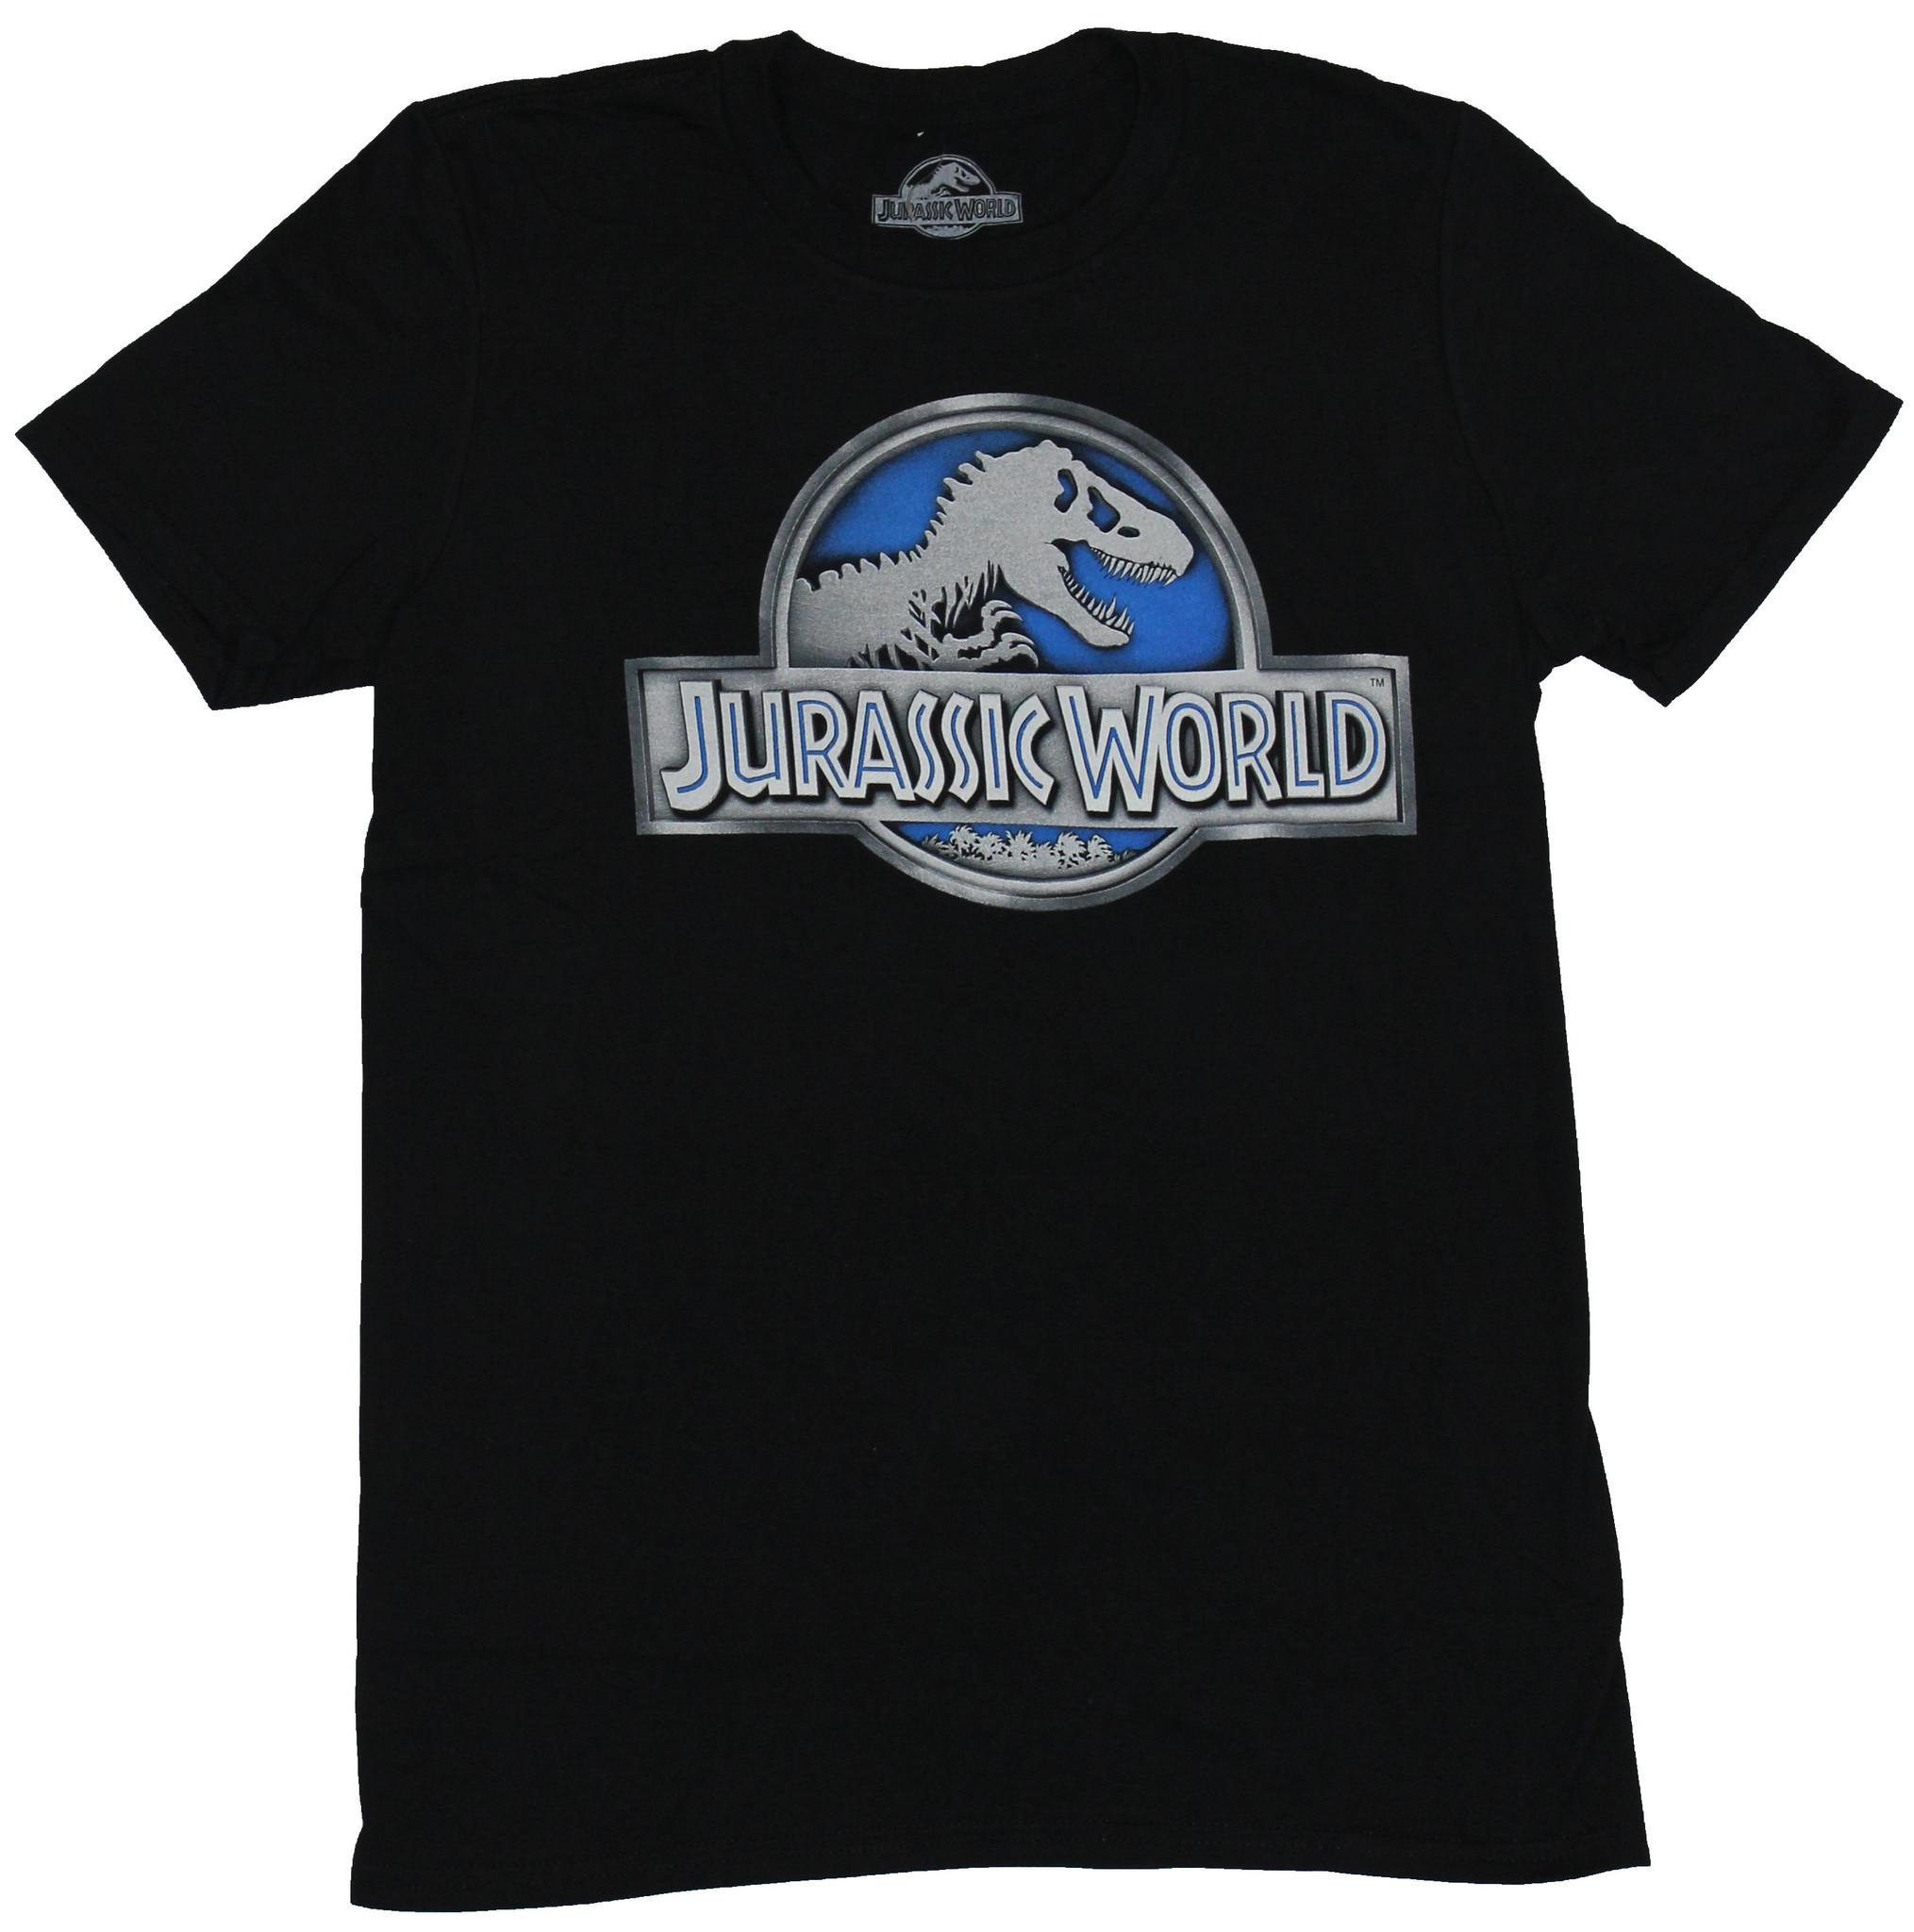 Jurassic World Mens T-Shirt - Silver White Blue Park Logo Image